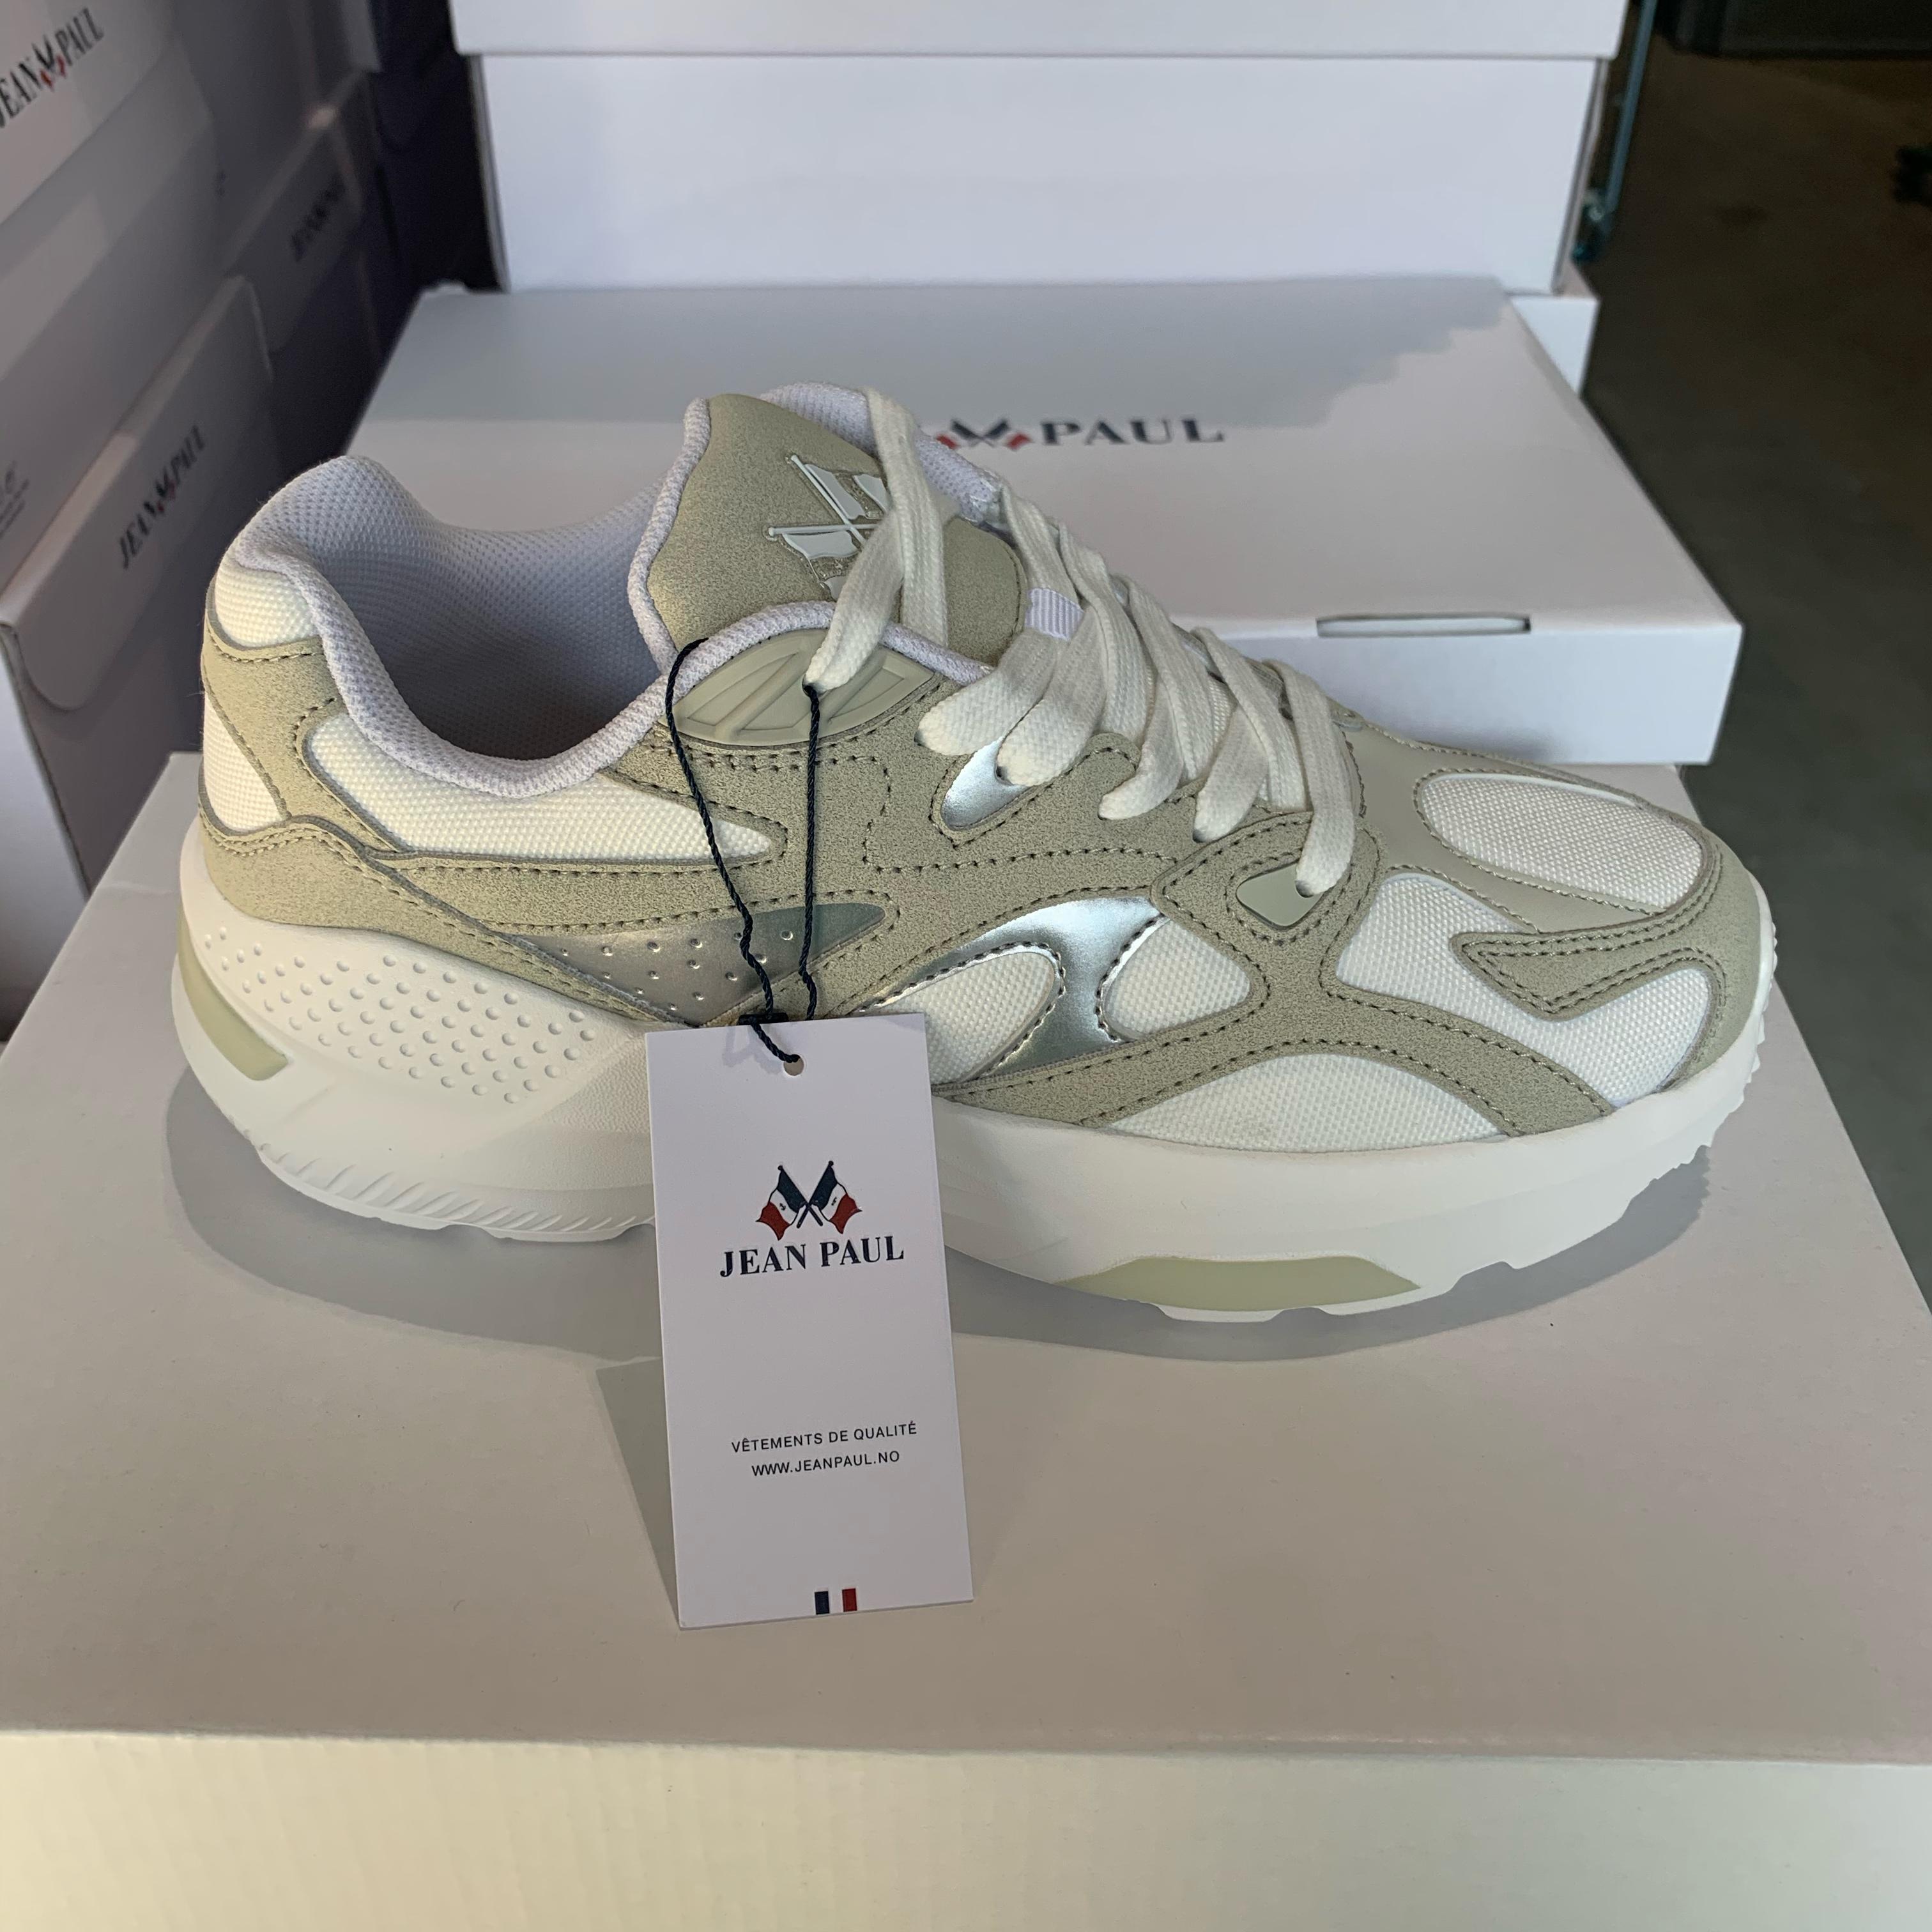 jean paul aix chunky sneakers white beige1